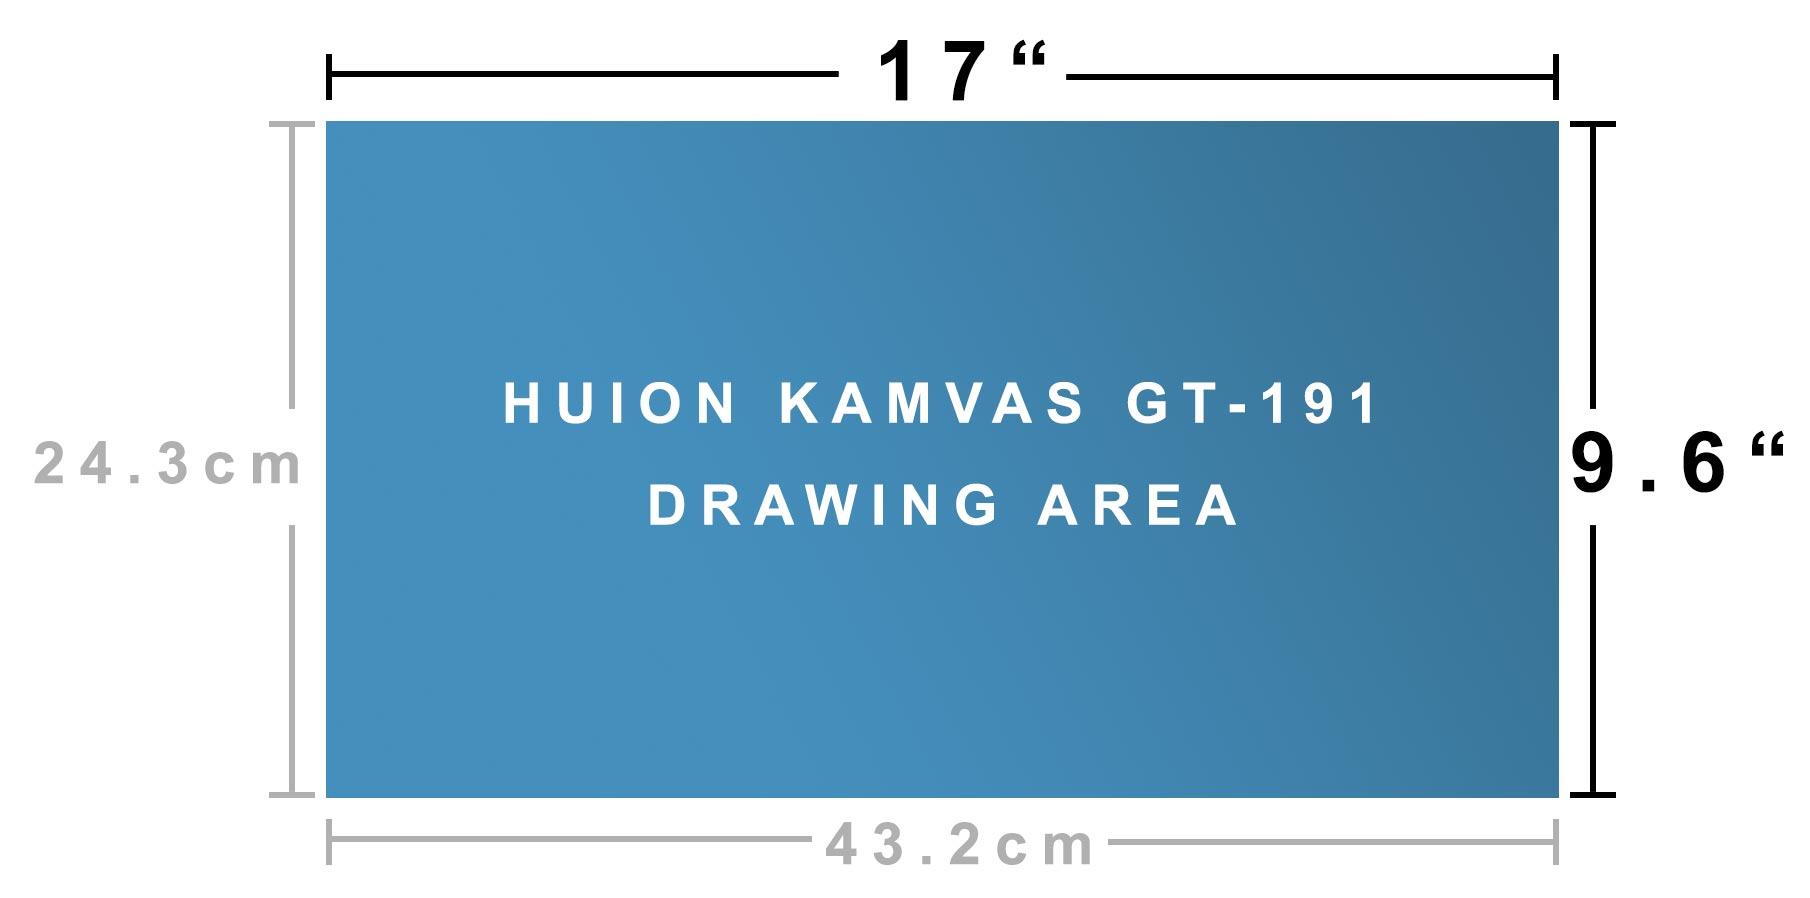 Huion KAMVAS GT-191 screen size measurement